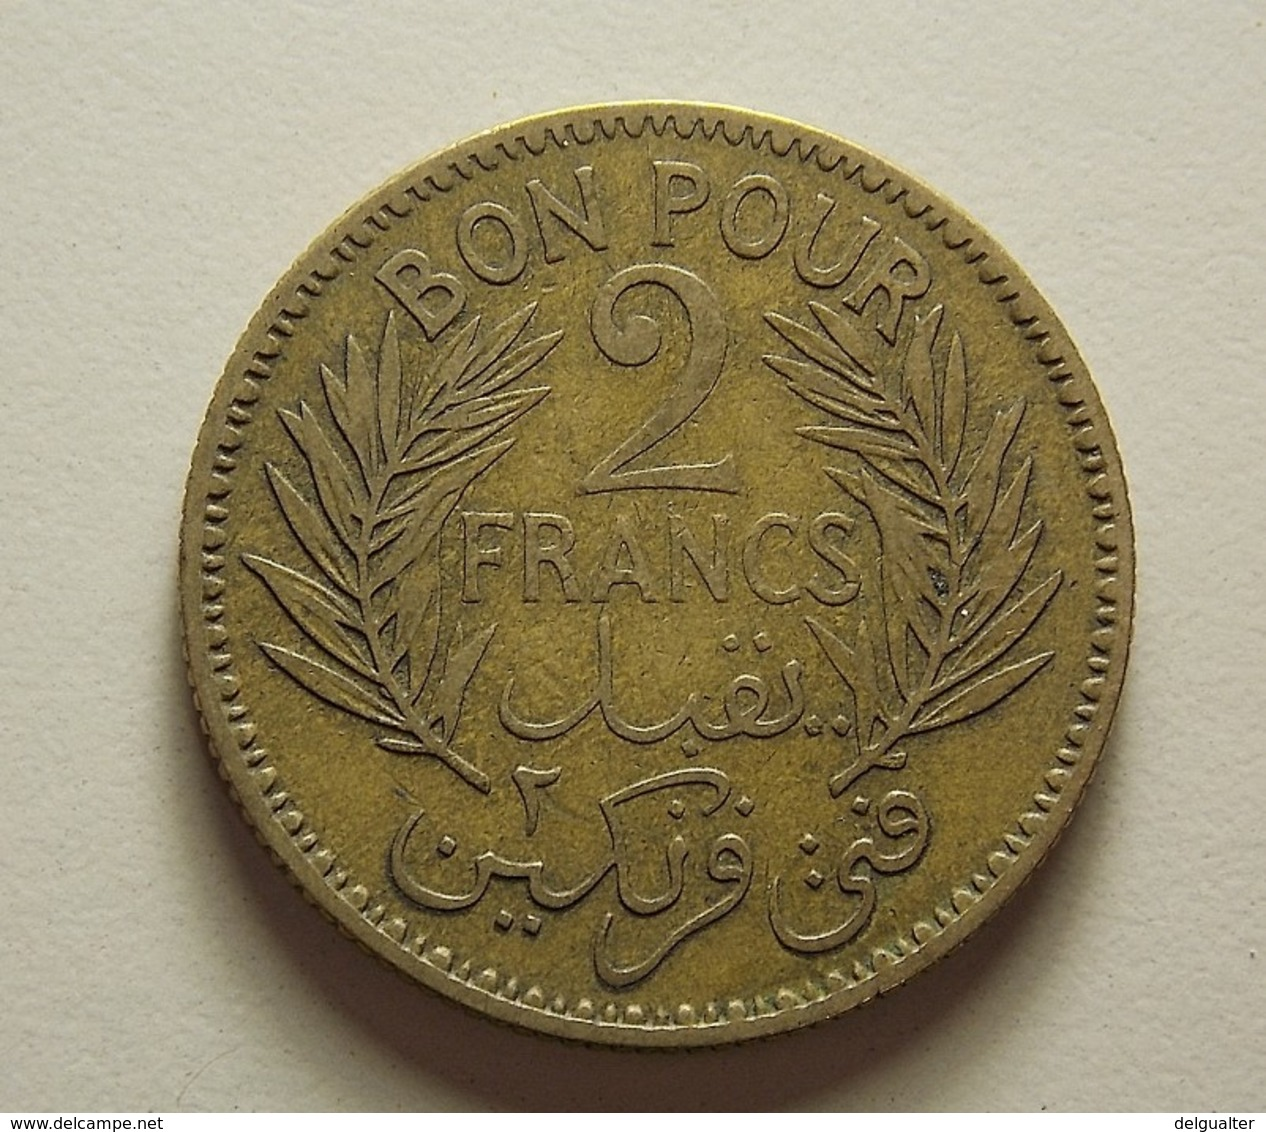 Tunisia 2 Francs 1941 - Tunesien